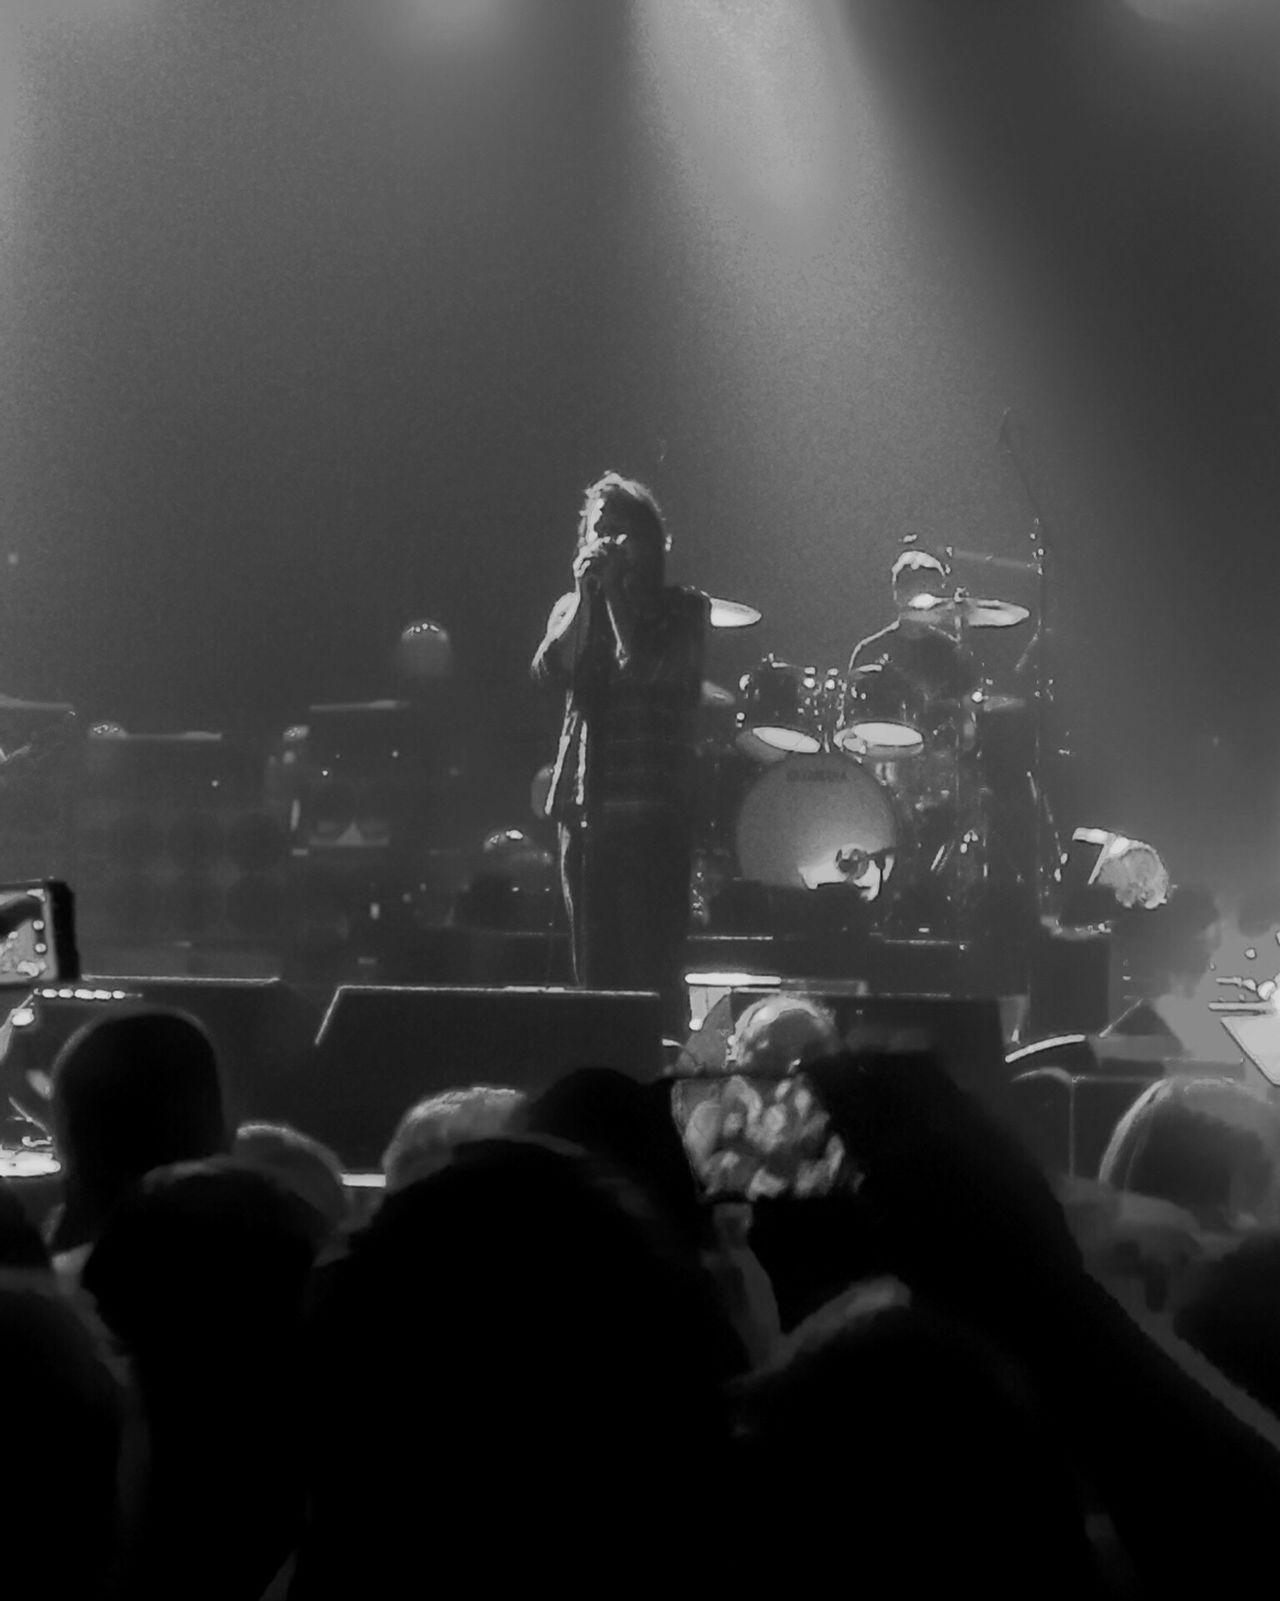 Pearl Jam 2014 tour-Memphis, TN Hello World Pearl Jam Live Music Concerts & Festivals Concerts Enjoying Life